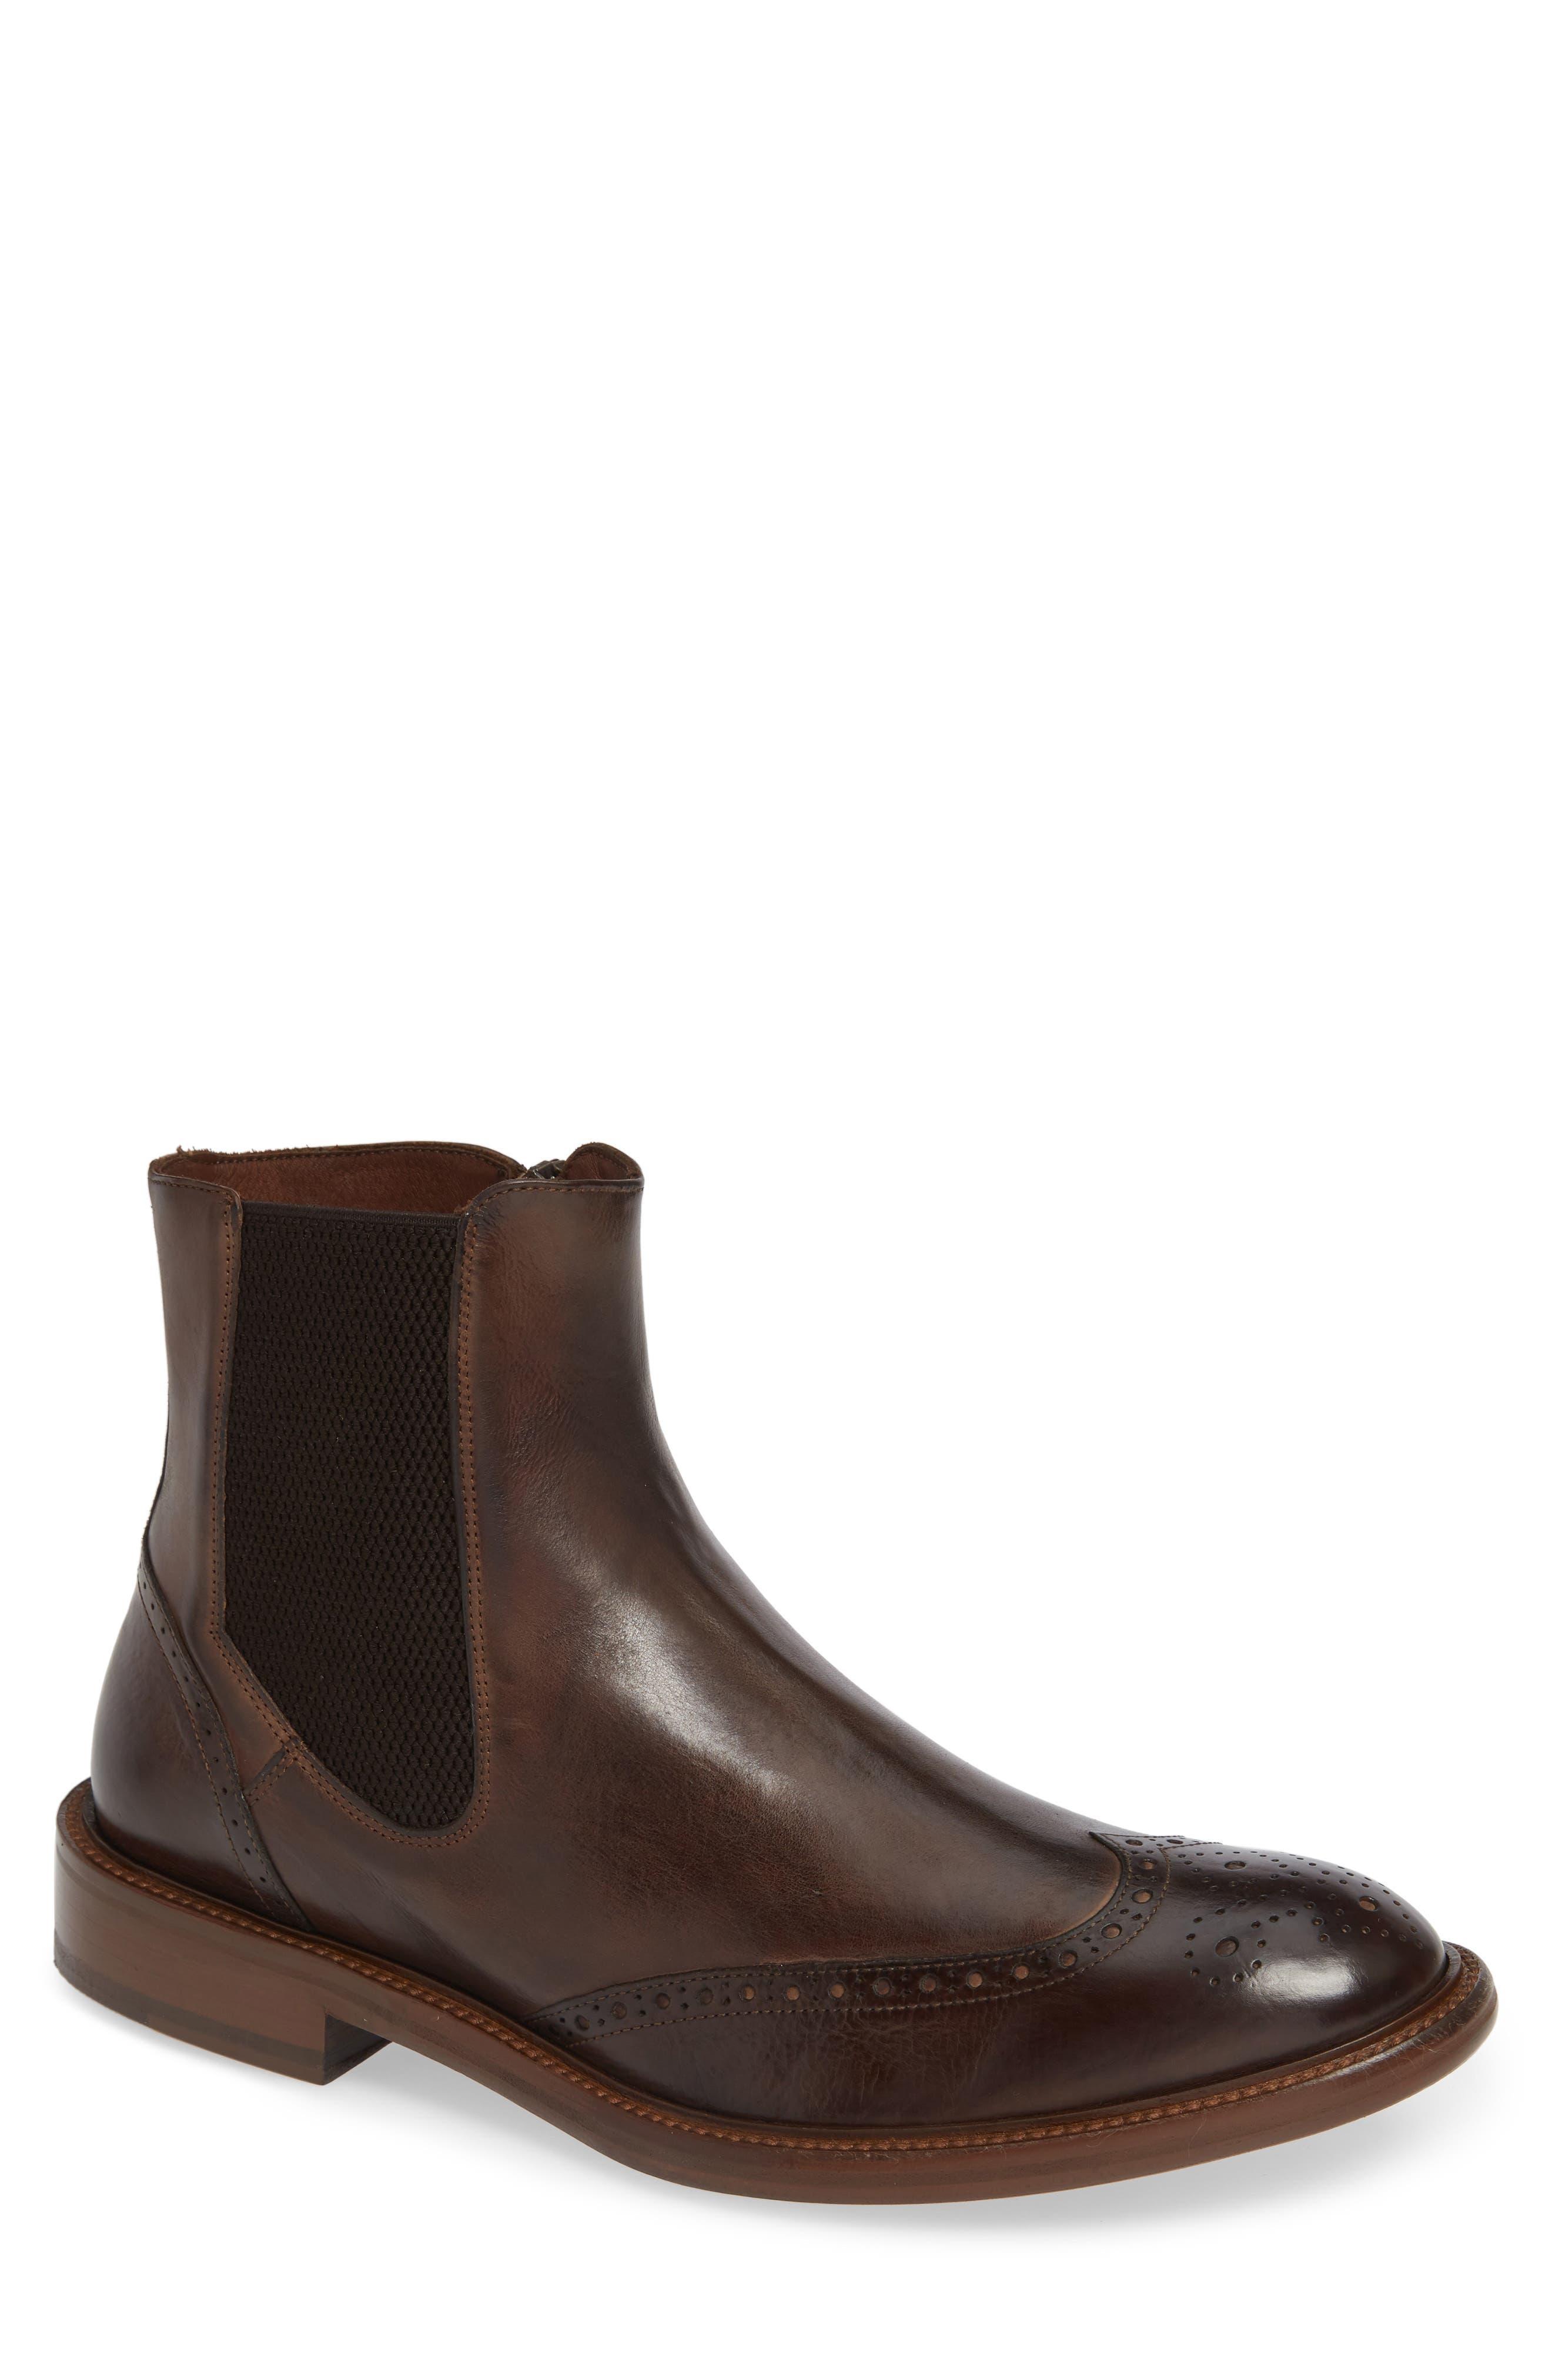 J & m 1850 Bryson Wingtip Chelsea Boot- Brown